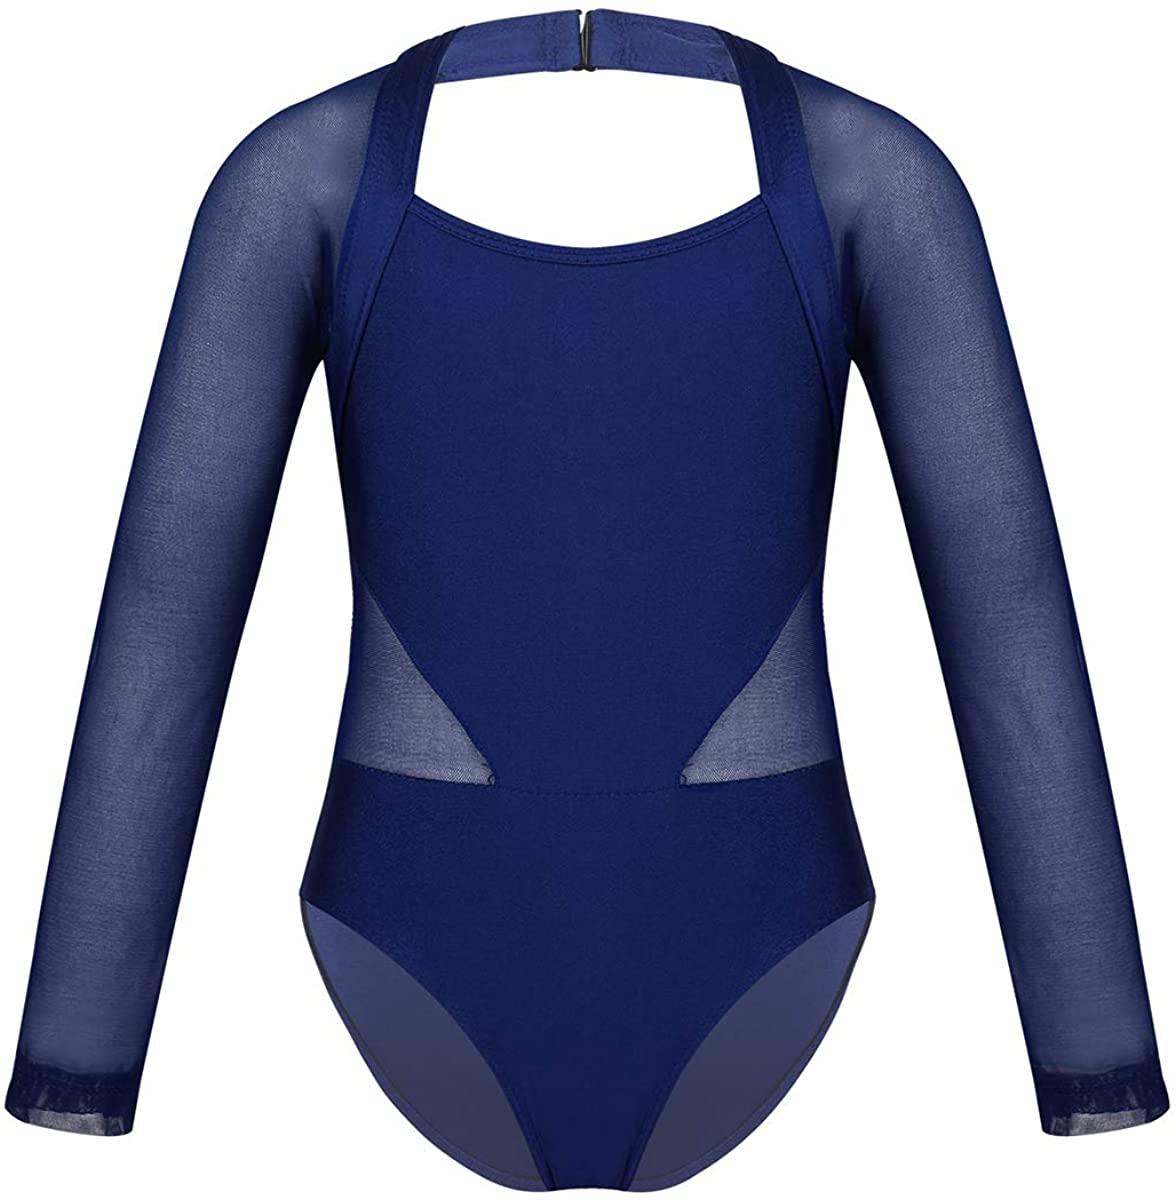 Agoky Kids Girls Ballet Dance Gymnastics Leotard Jumpsuit Cutout Back Mesh Splice Tank Sports Top Dance wear Costumes